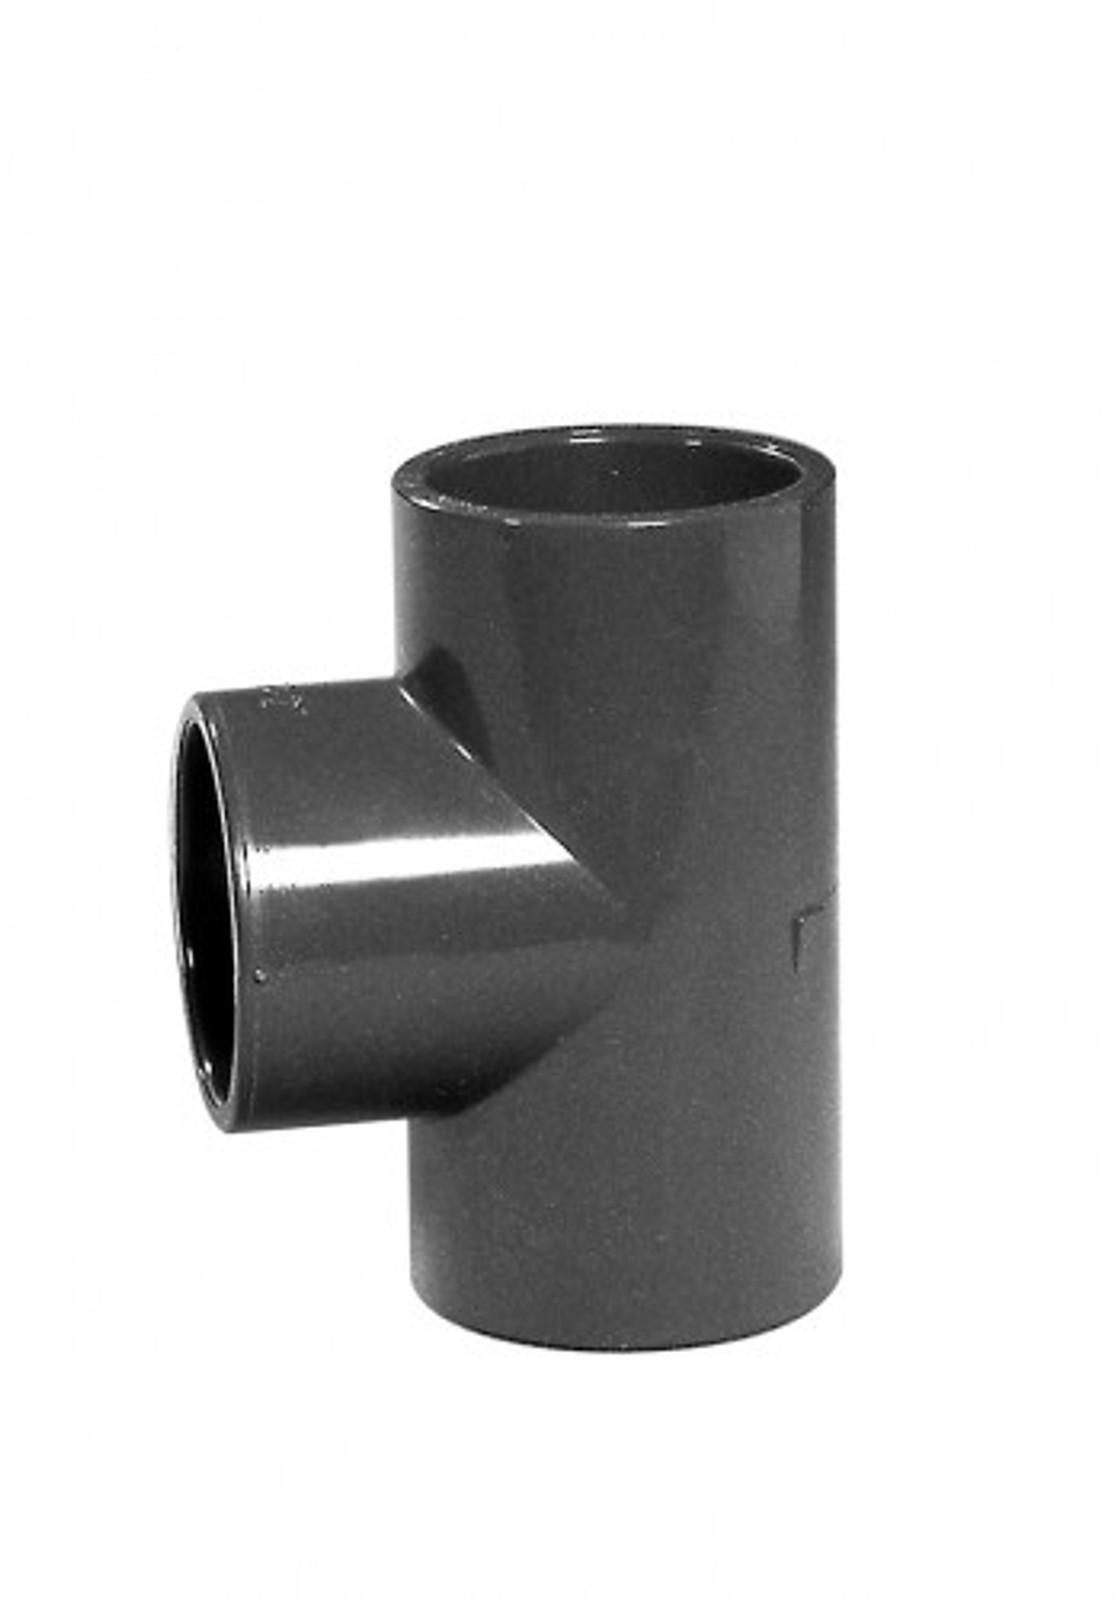 T-Stück 90°, 90 mm aus PVC